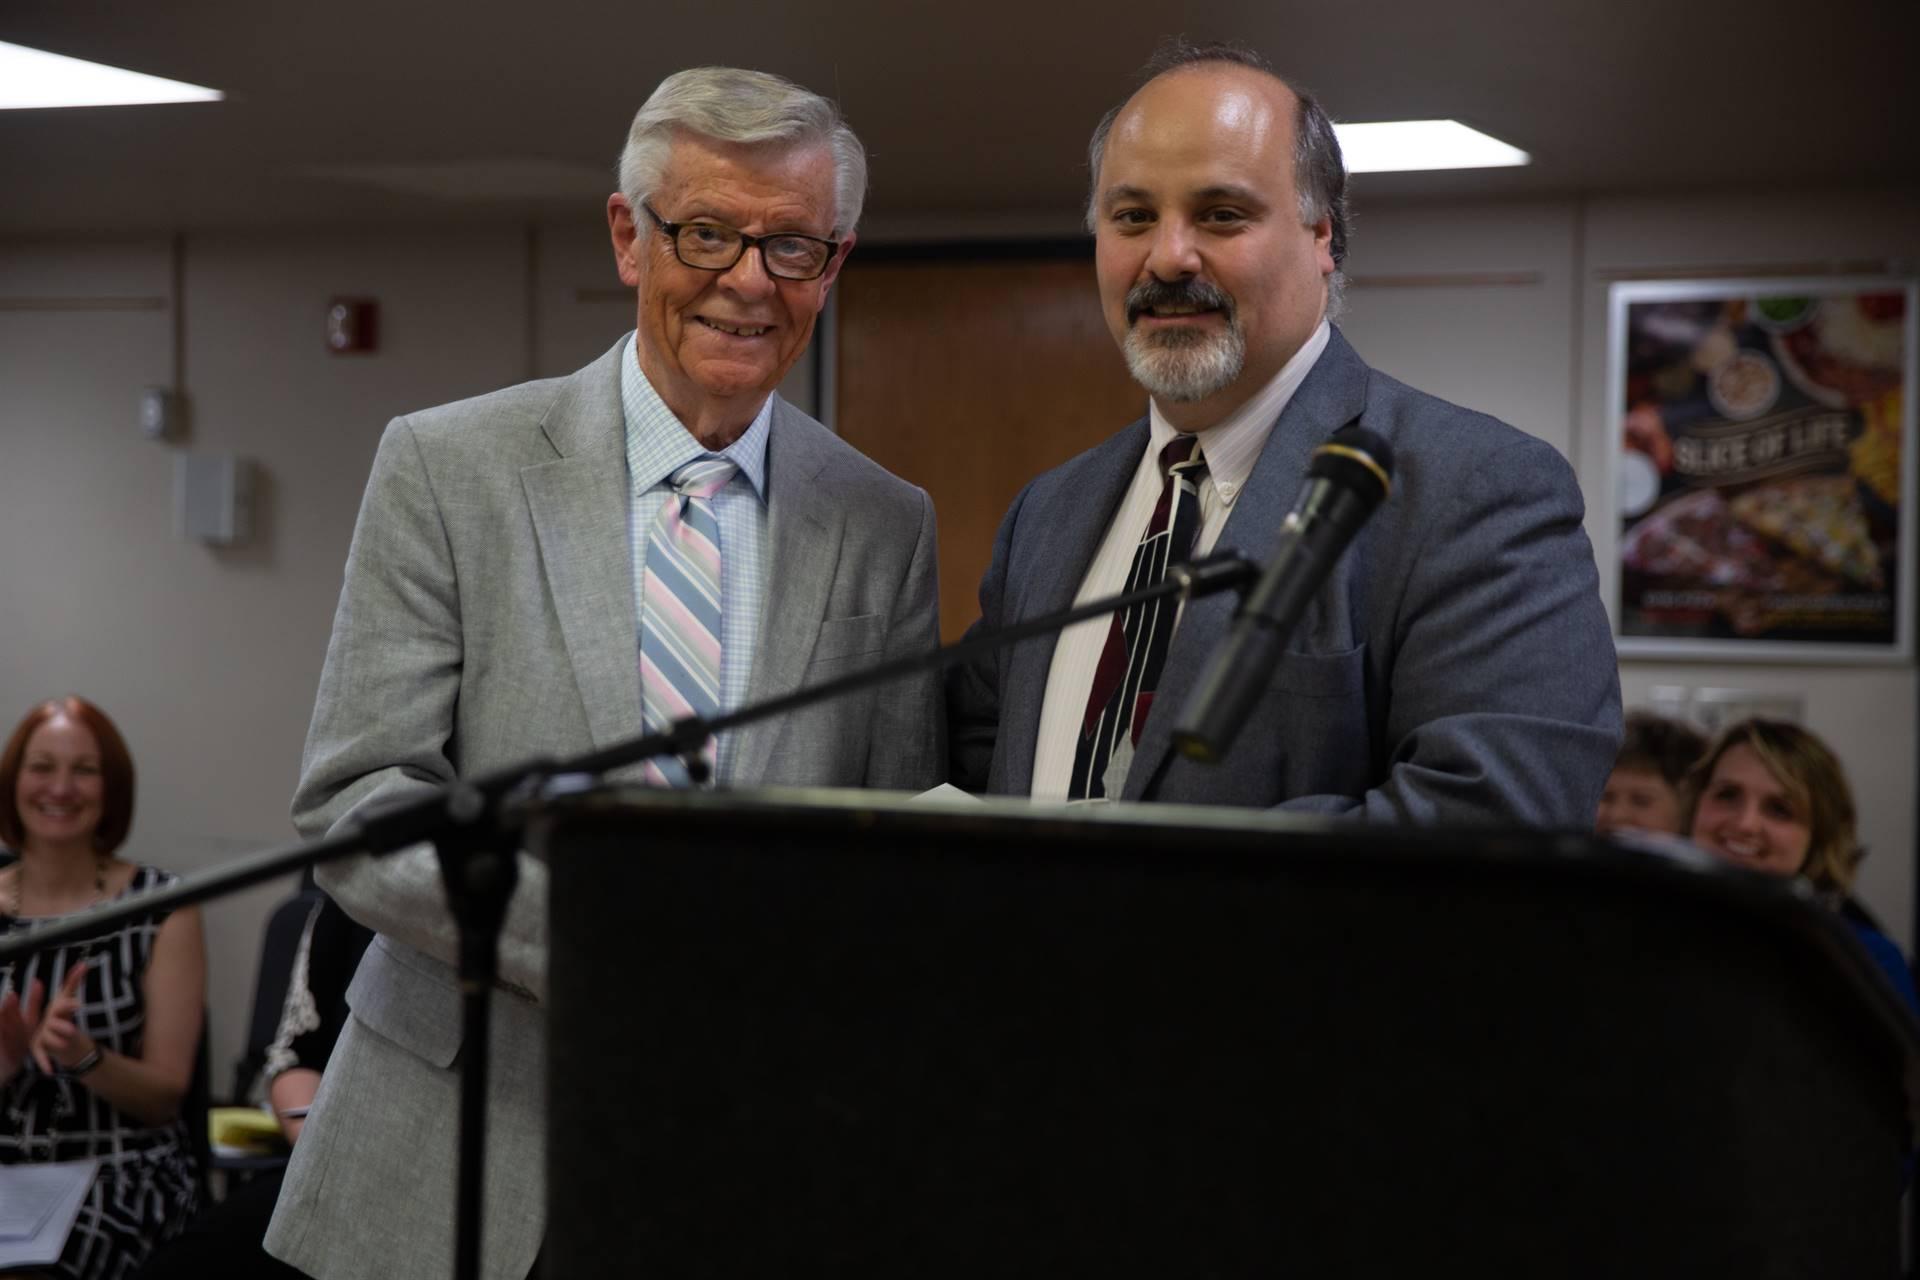 Dr. John Guzzetti with Mr. William Lohr